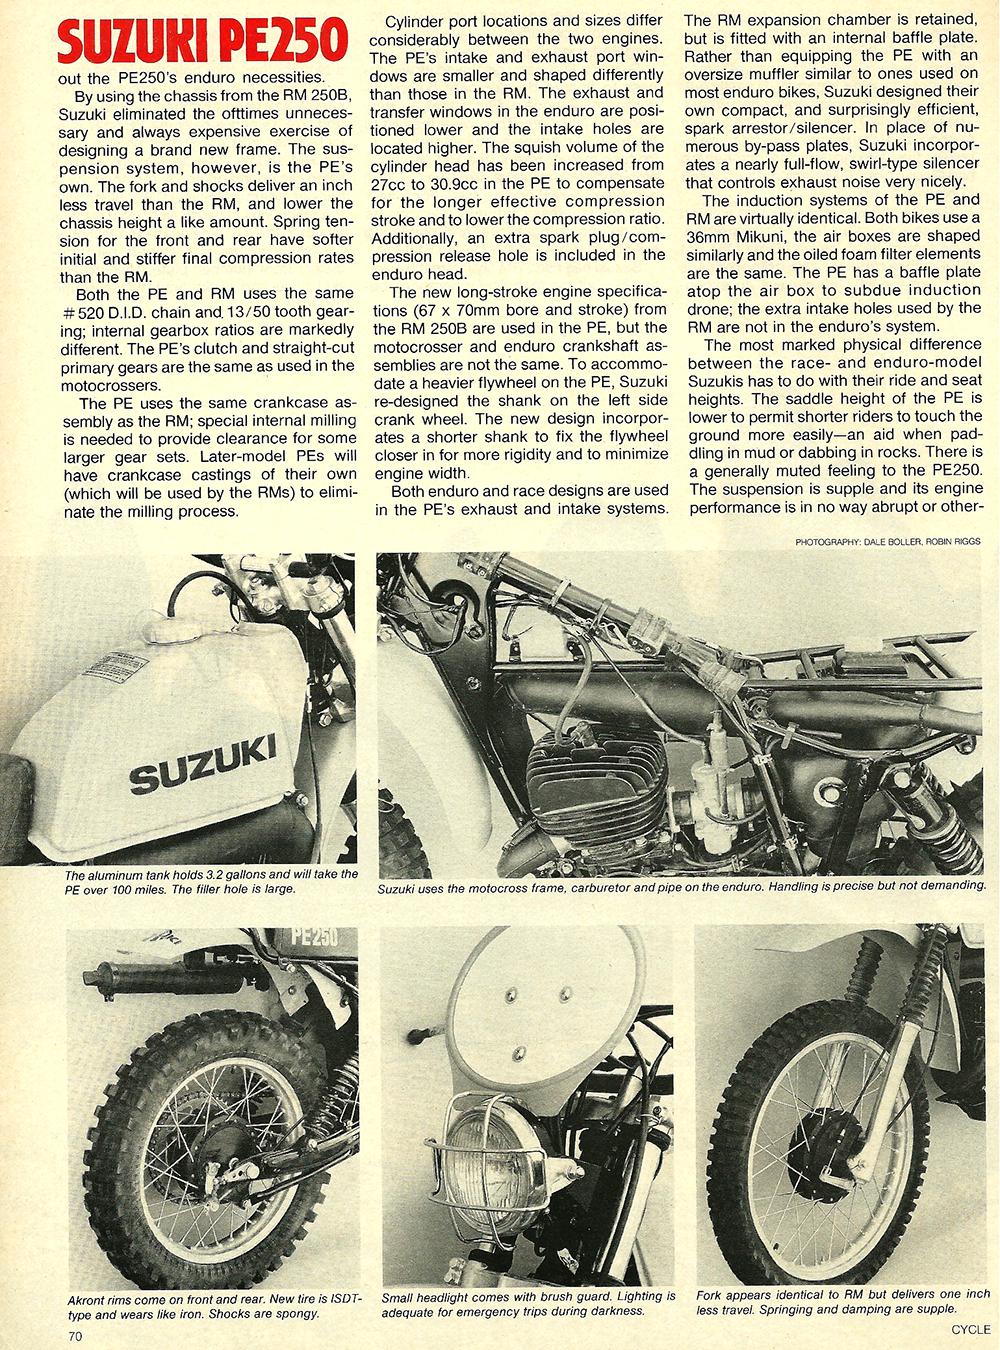 1977 Suzuki PE250 road test 3.jpg